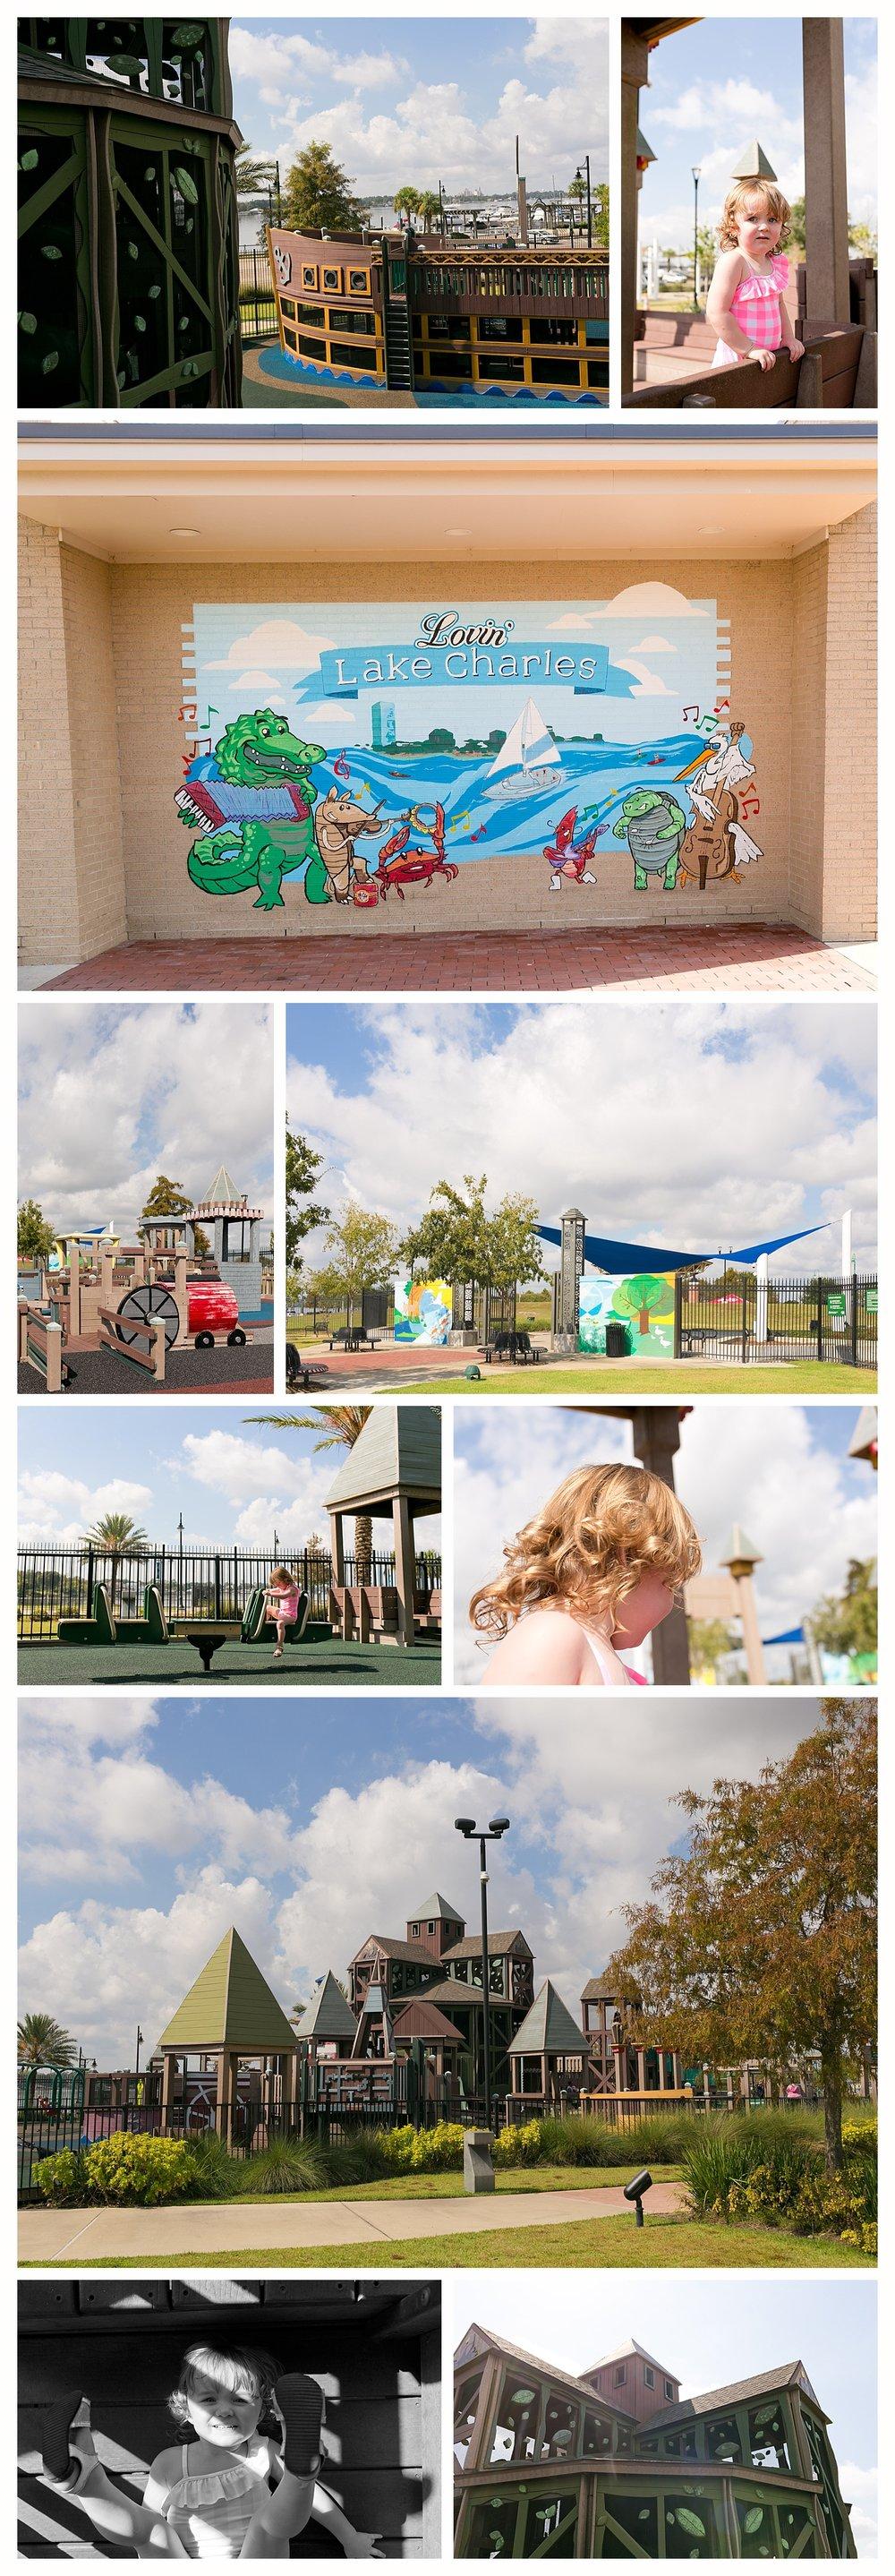 Millennium Park playground in Lake Charles, Louisiana